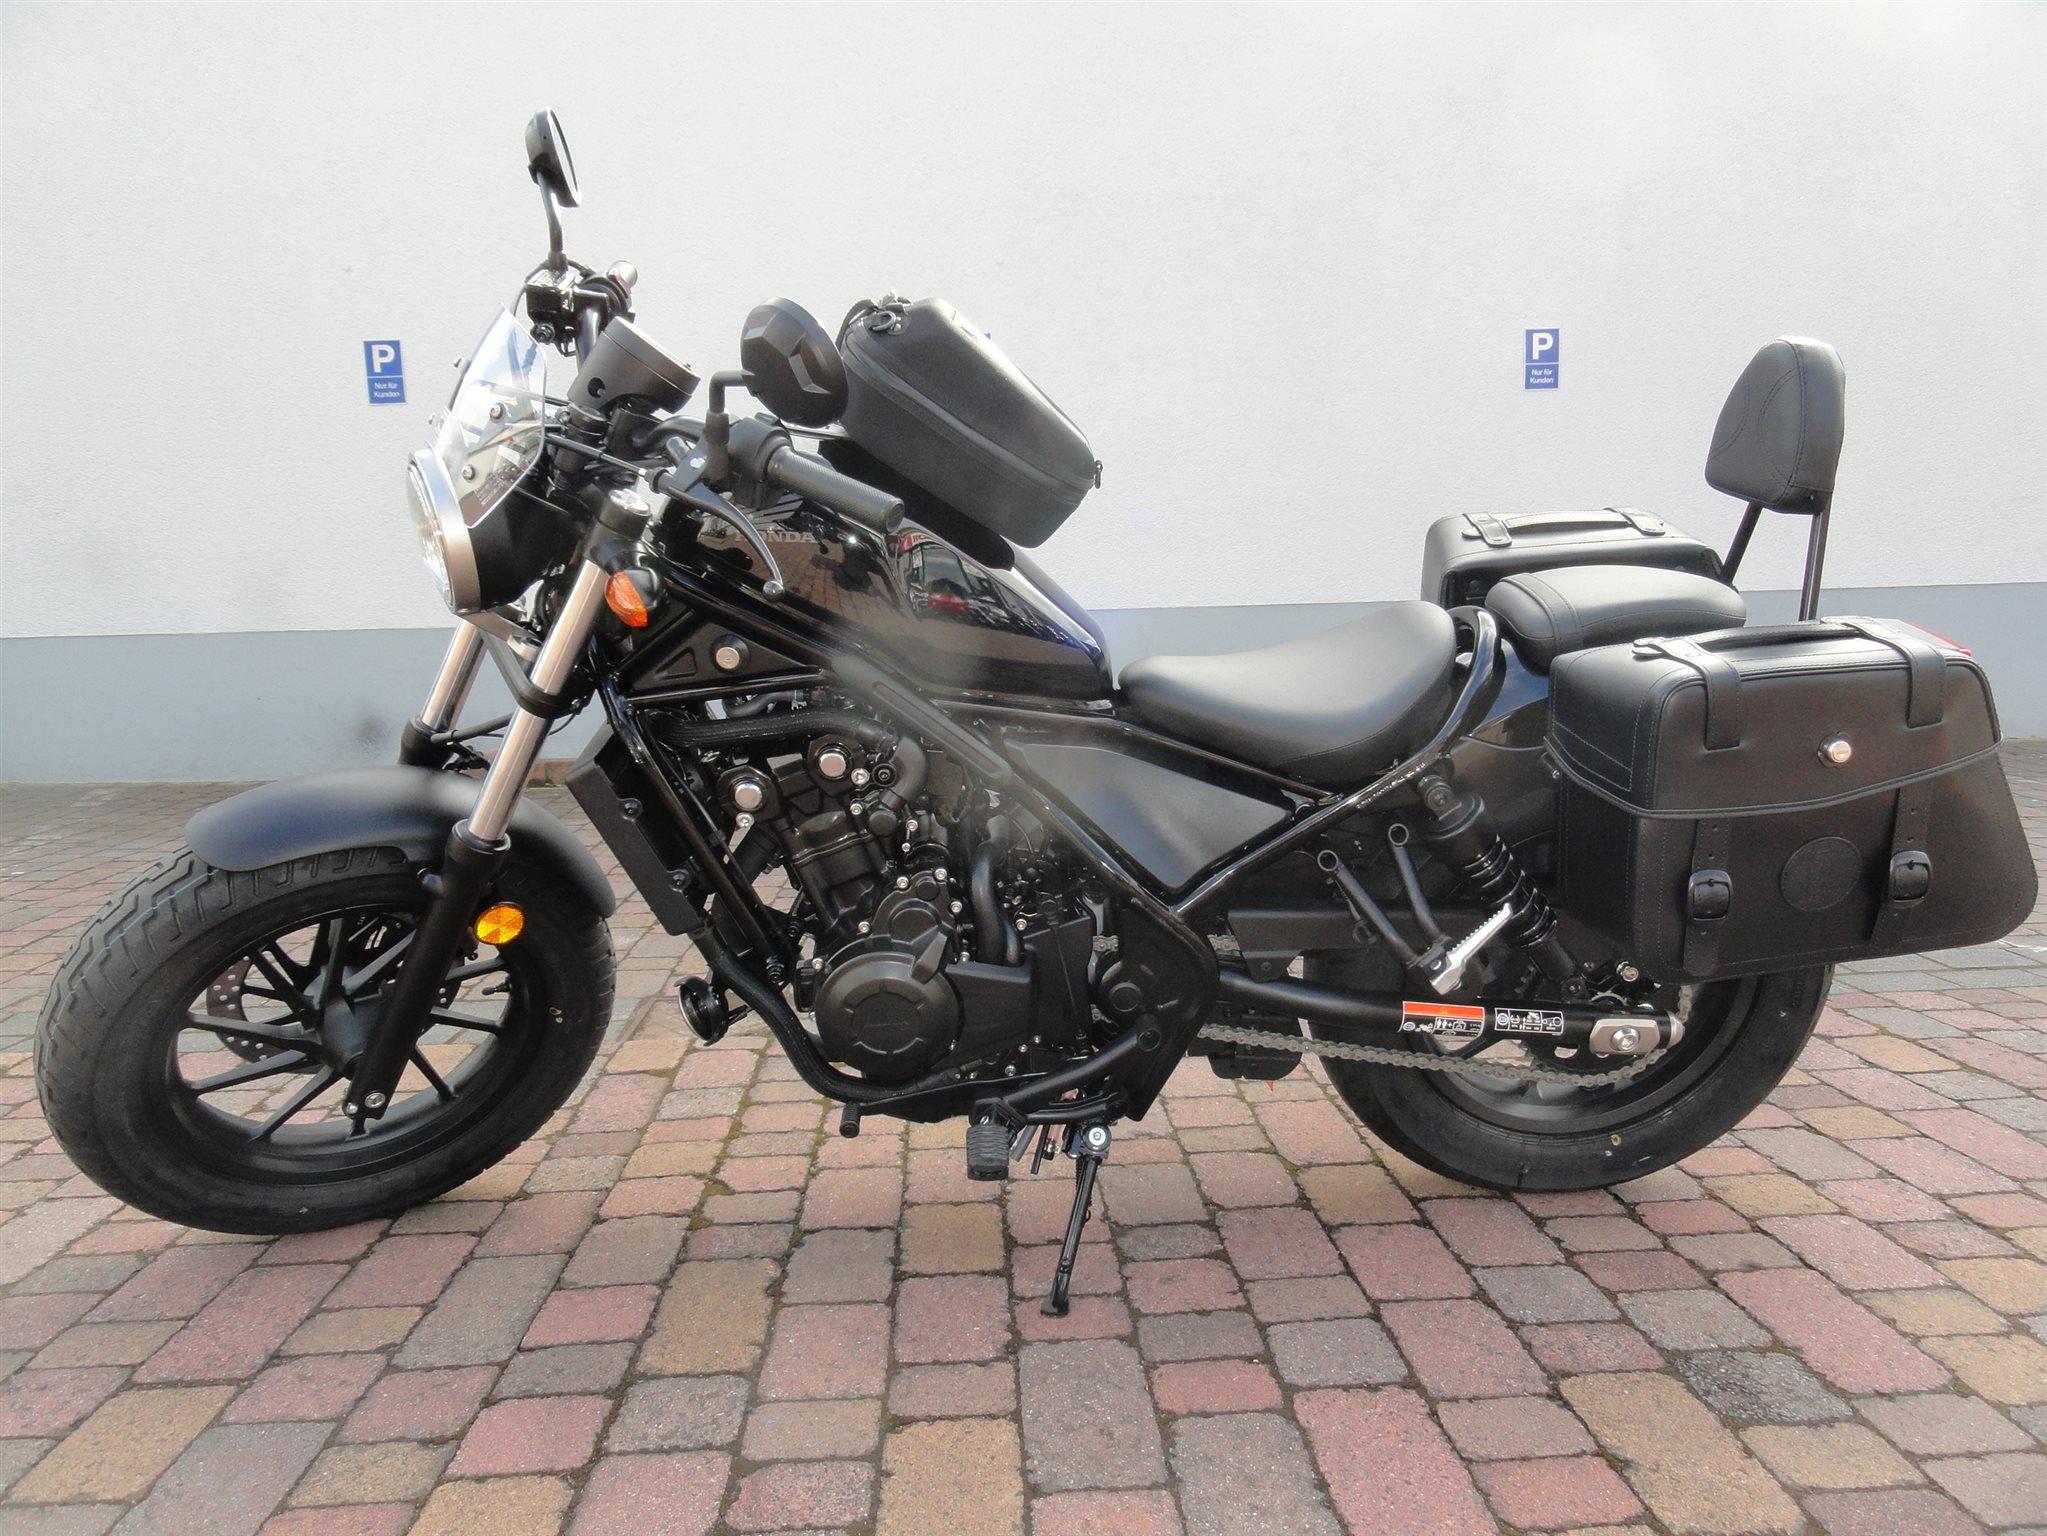 umgebautes motorrad honda cmx500 rebel von motorradtechnik. Black Bedroom Furniture Sets. Home Design Ideas